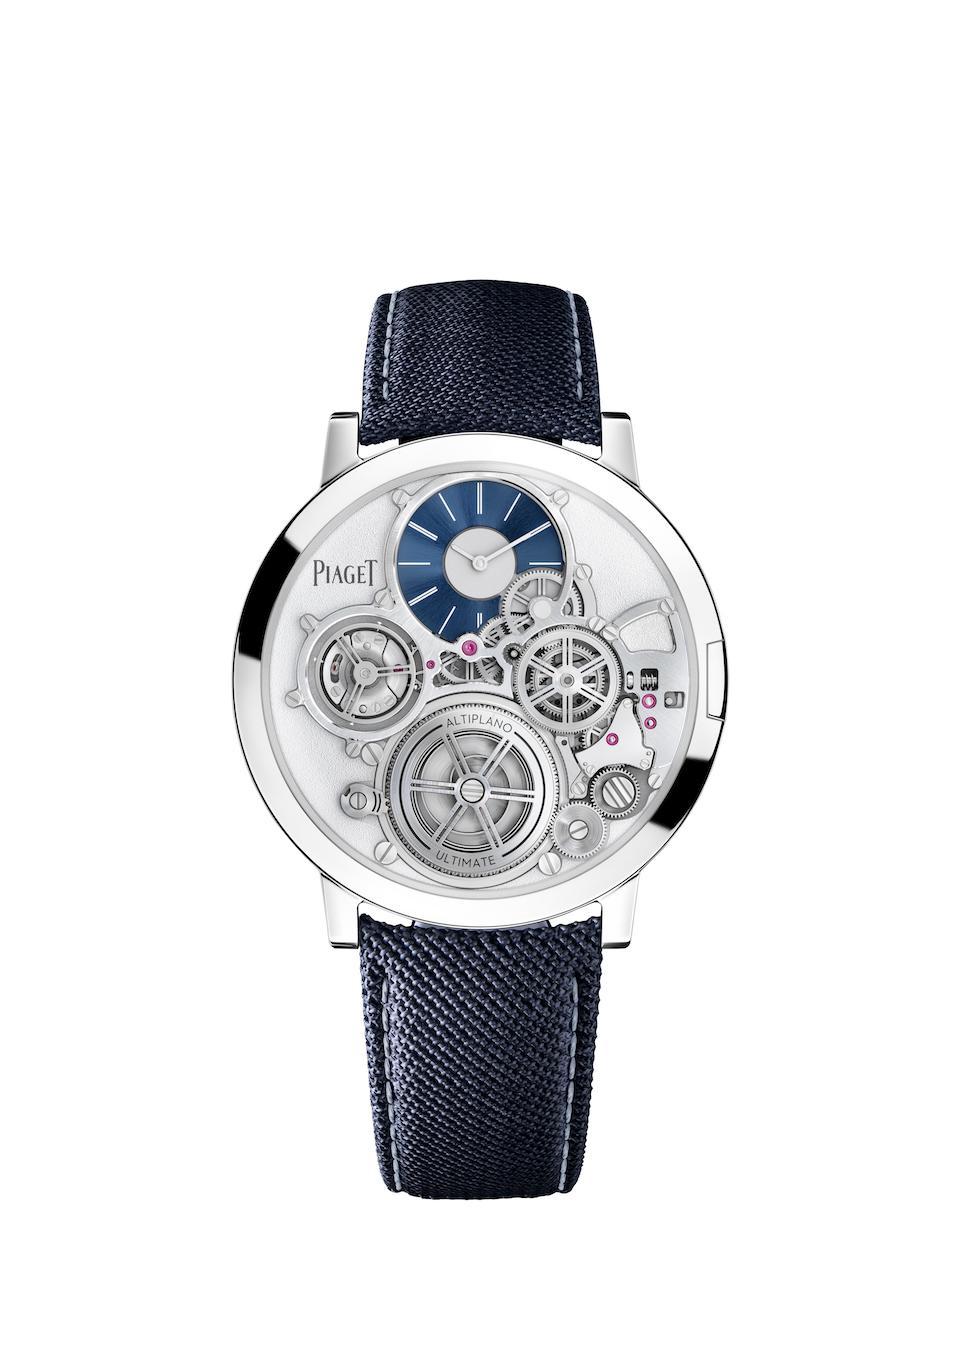 PiagetAltiplano Ultimate Concept watch.